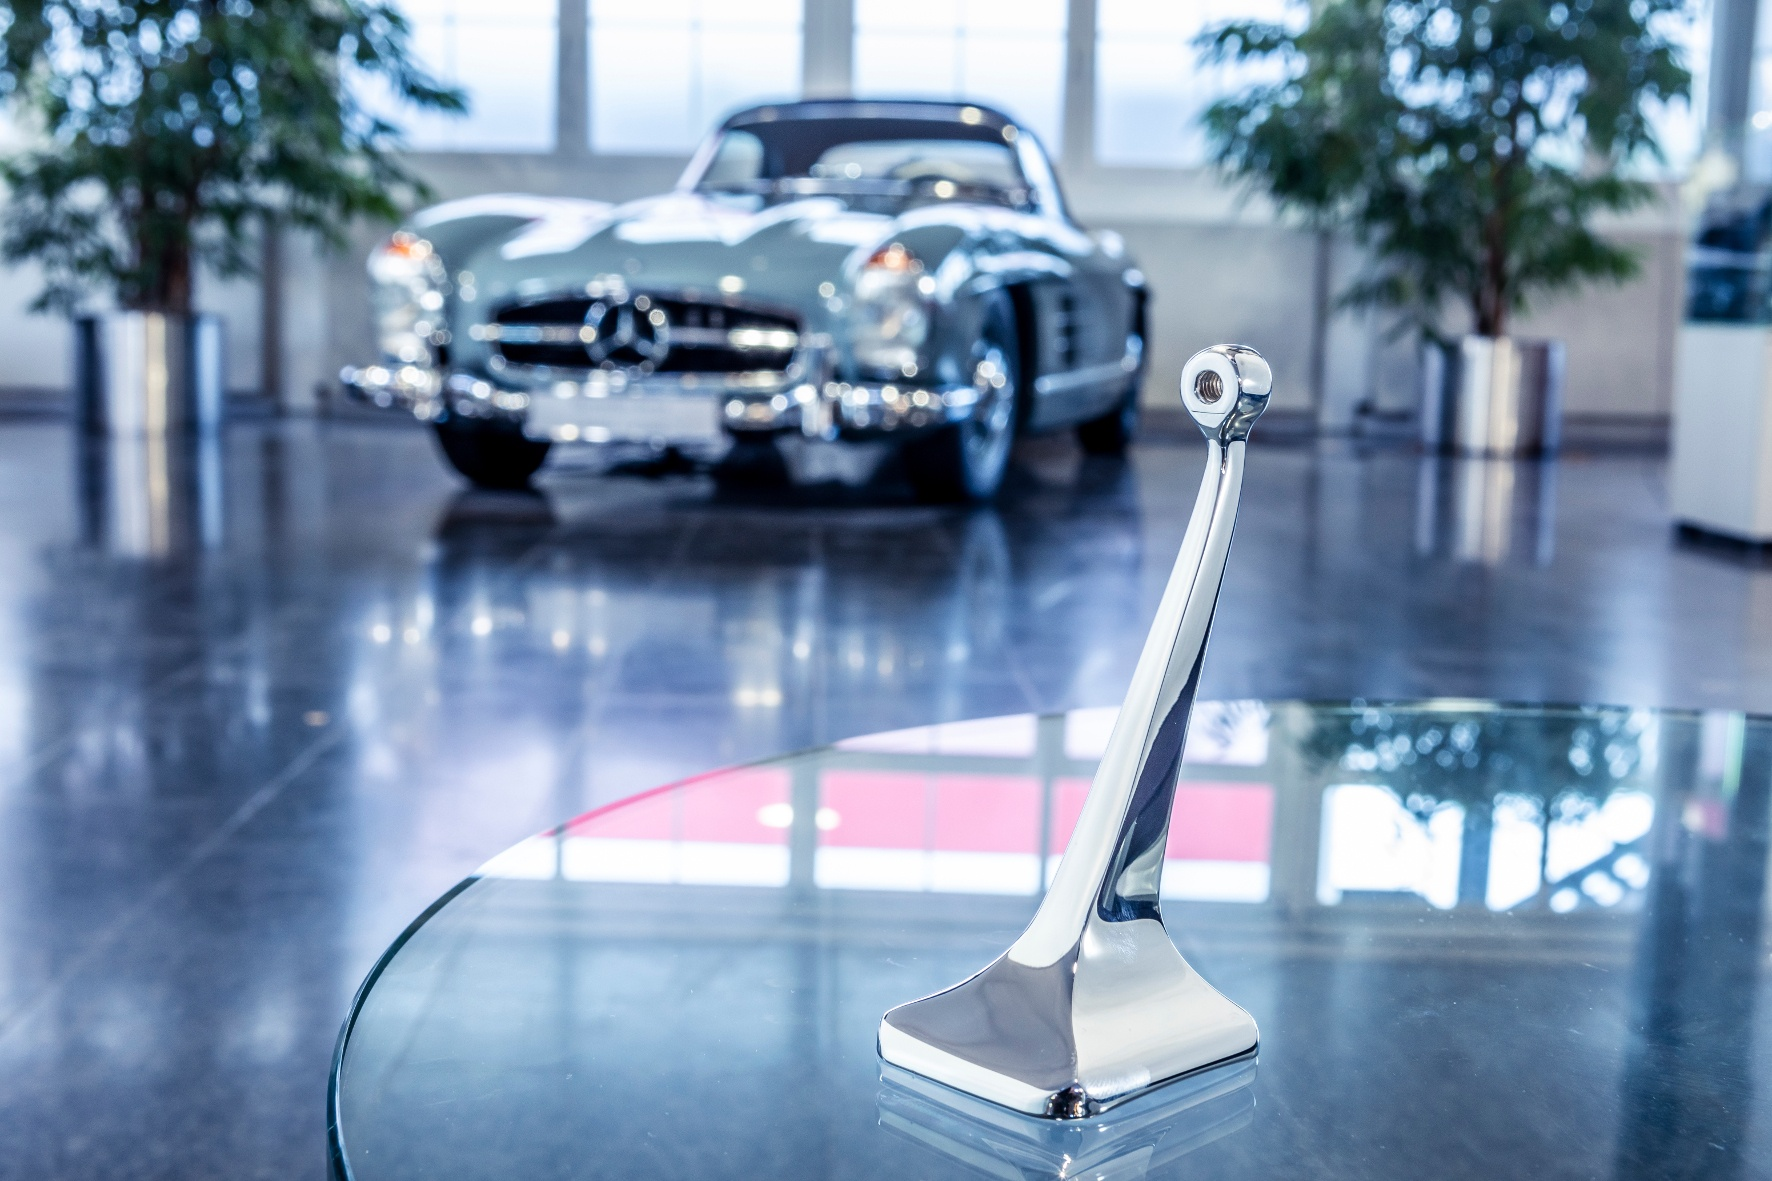 Mercedes-Classic-Cars Ersatzteile druckfrisch  aus dem 3D-Drucker